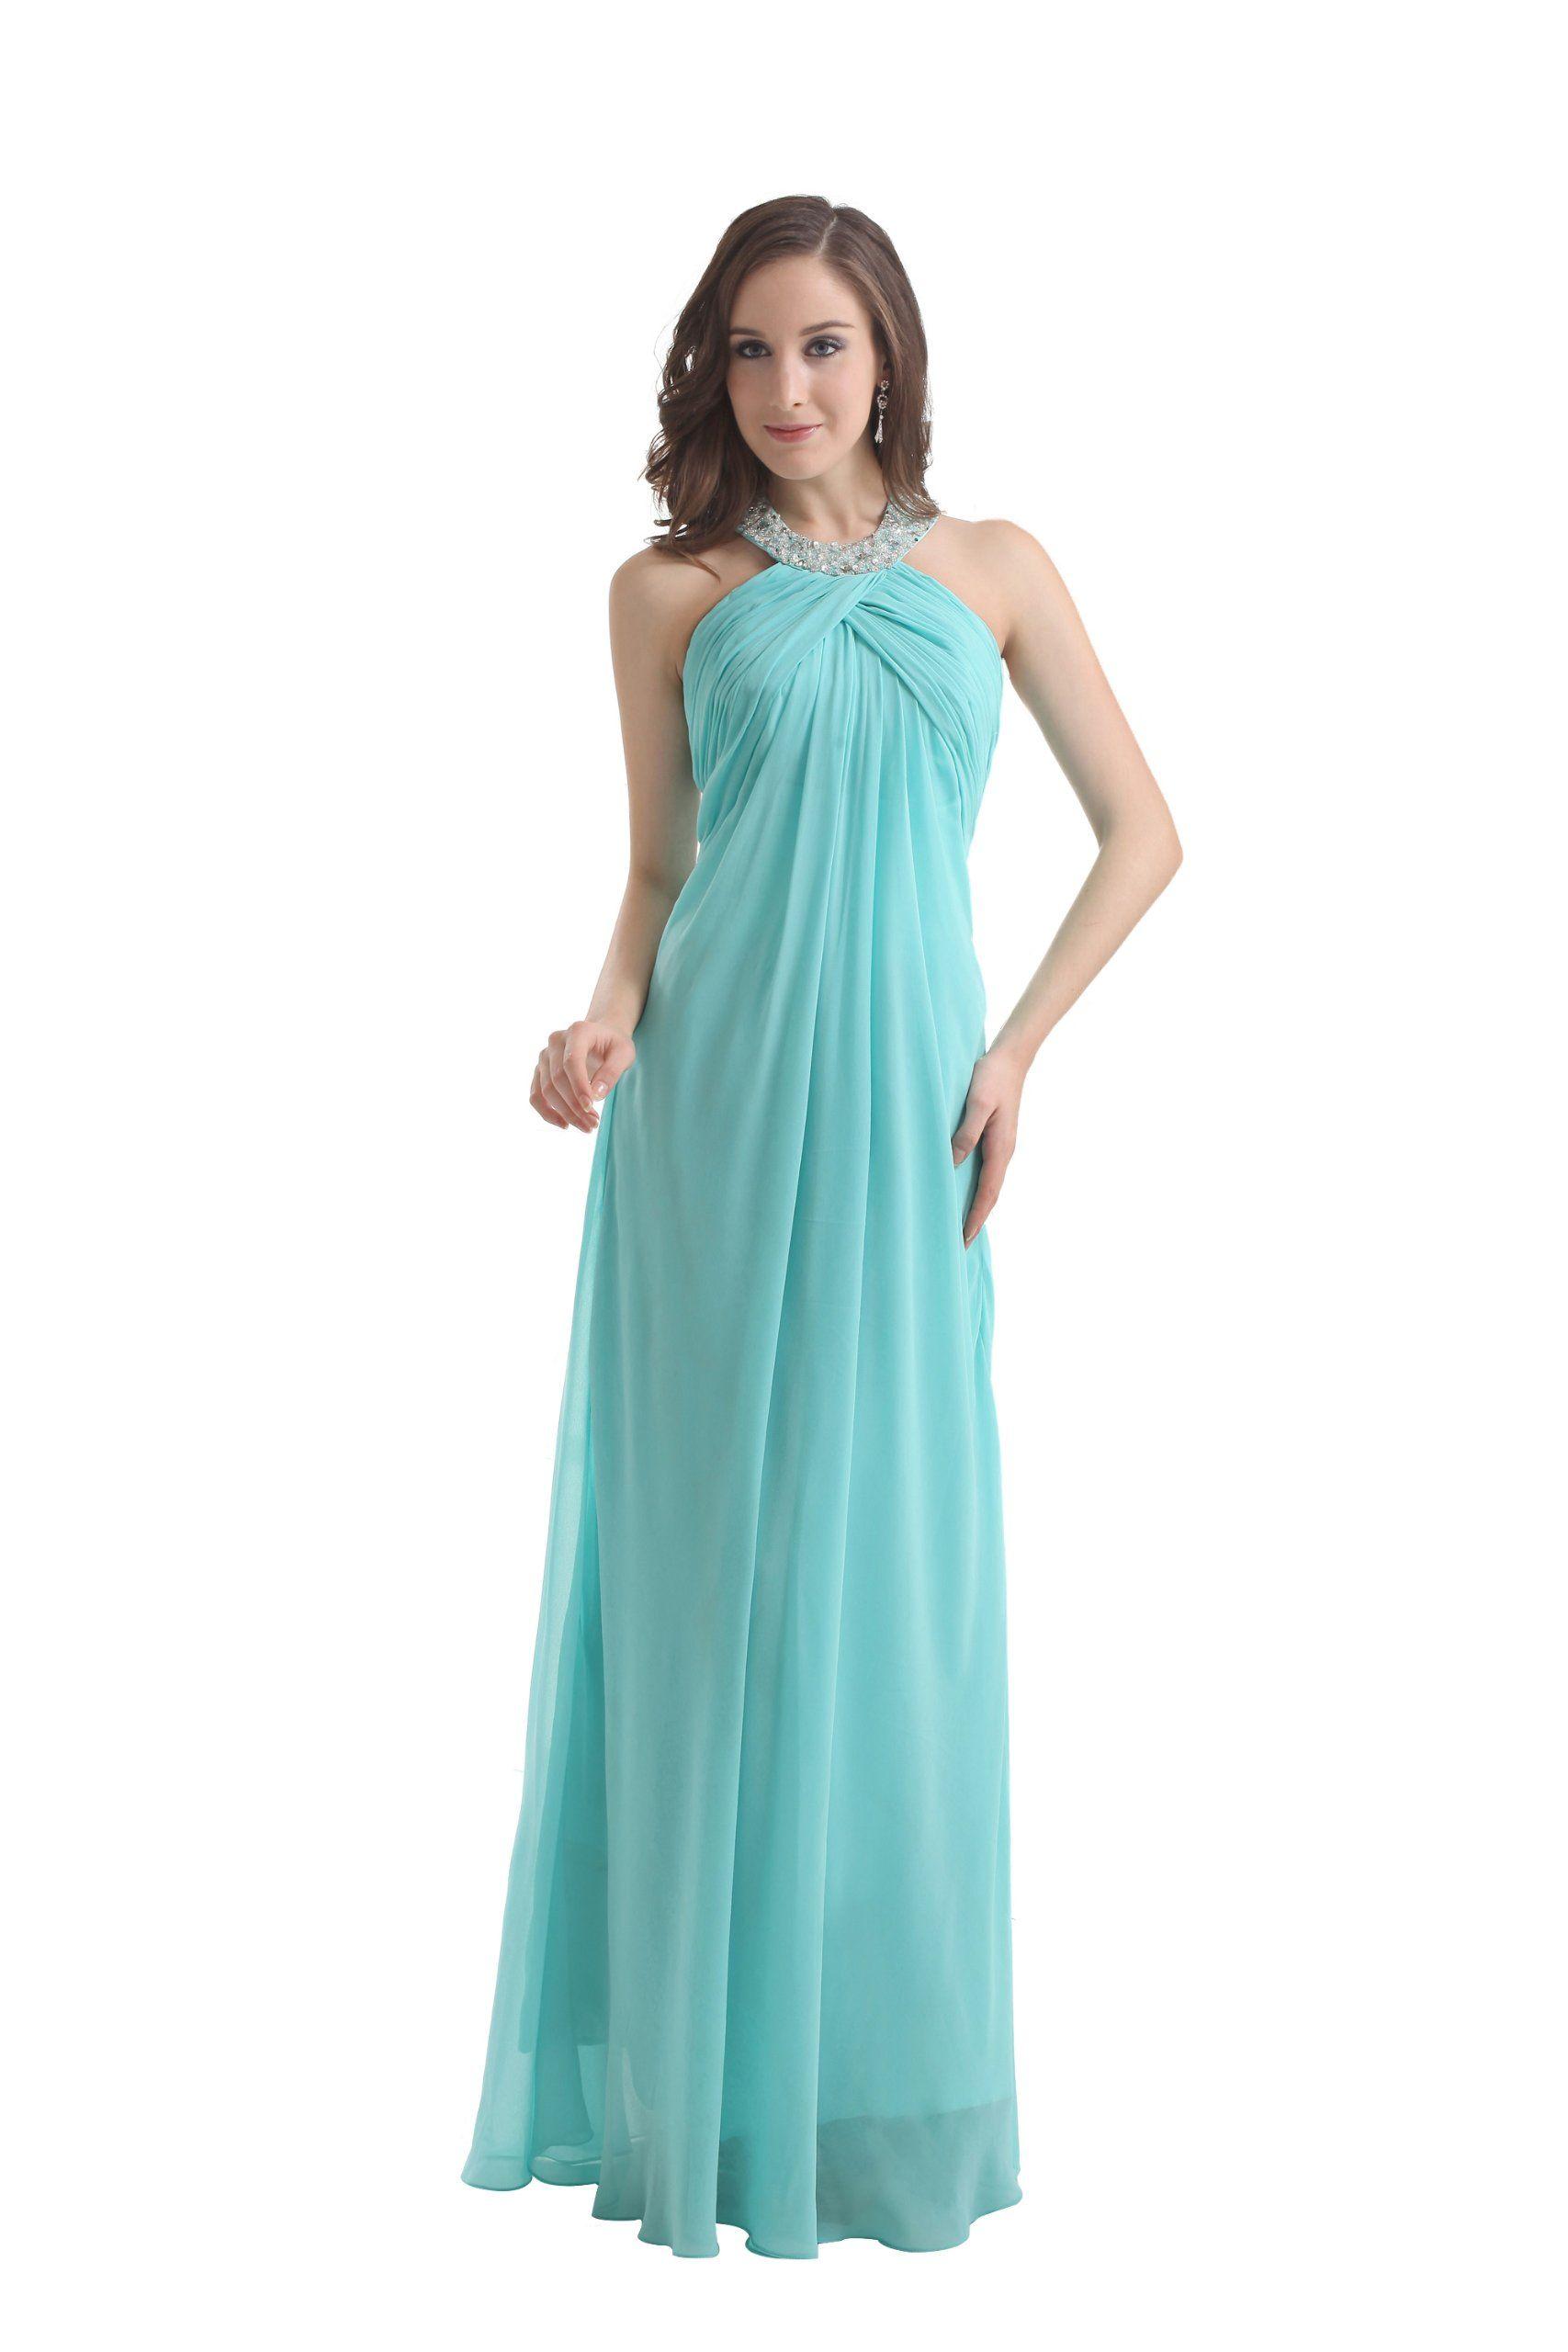 herafa p31515-2 Evening Gowns Elegant Halter Sleeveless Ruched ...